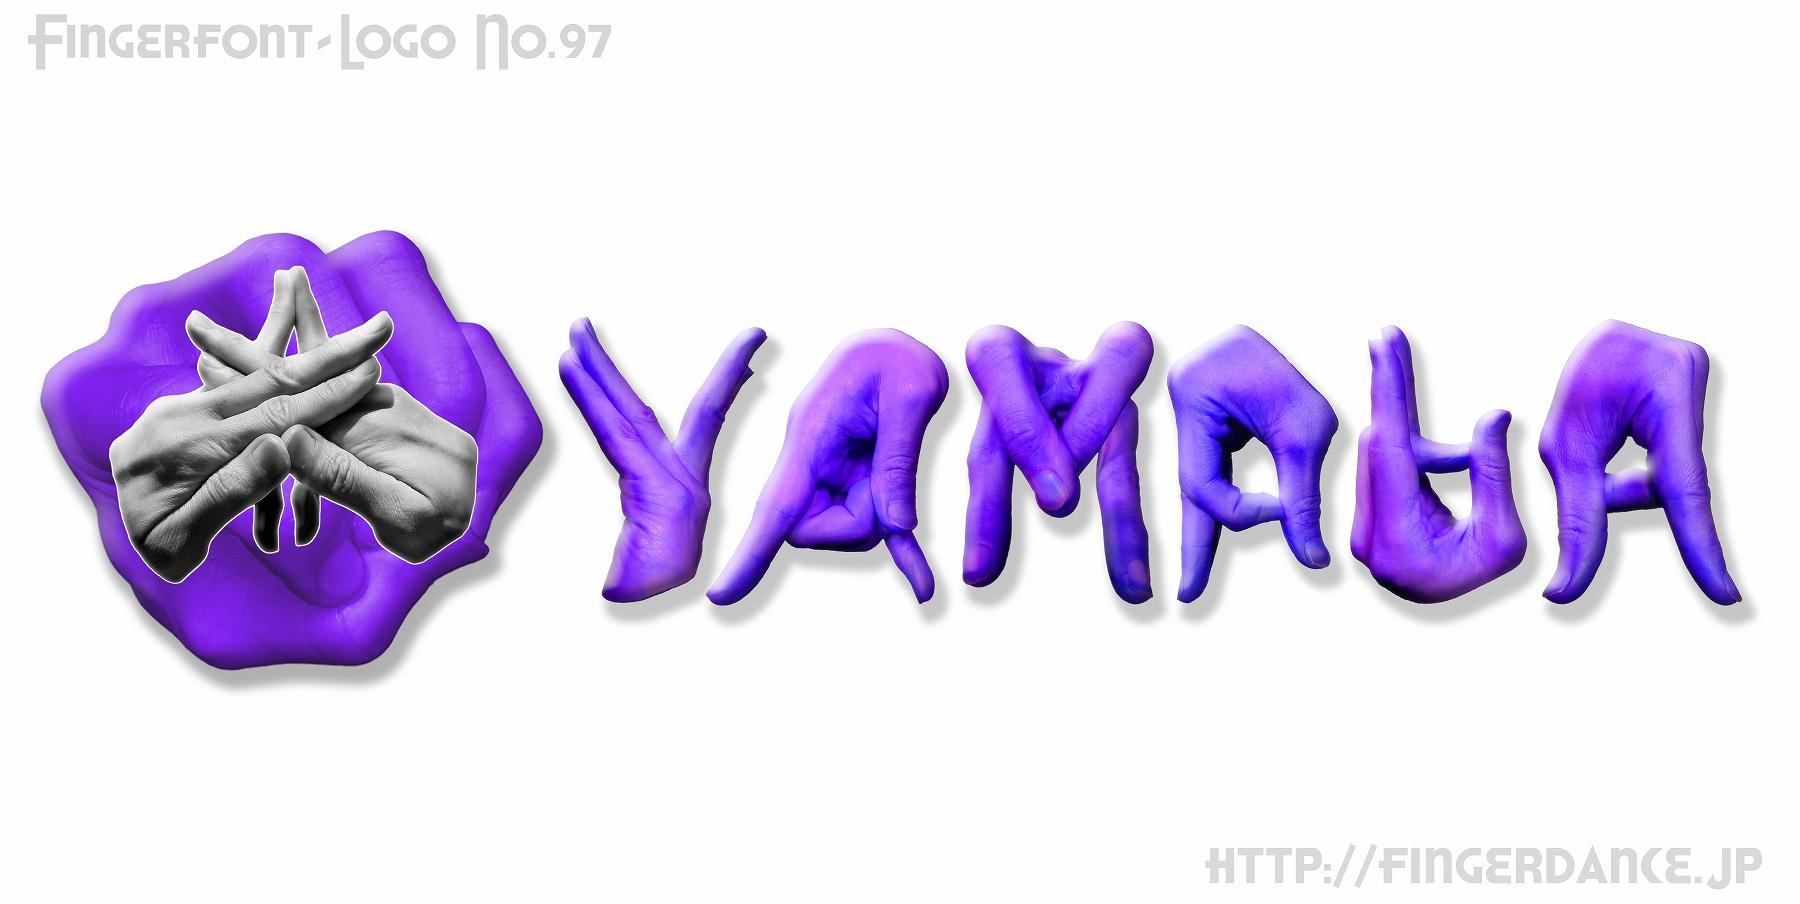 Yamaha-fingerhttp://fingerdance.jp/L/logohand ヤマハ・フィンガーロゴハンド手指